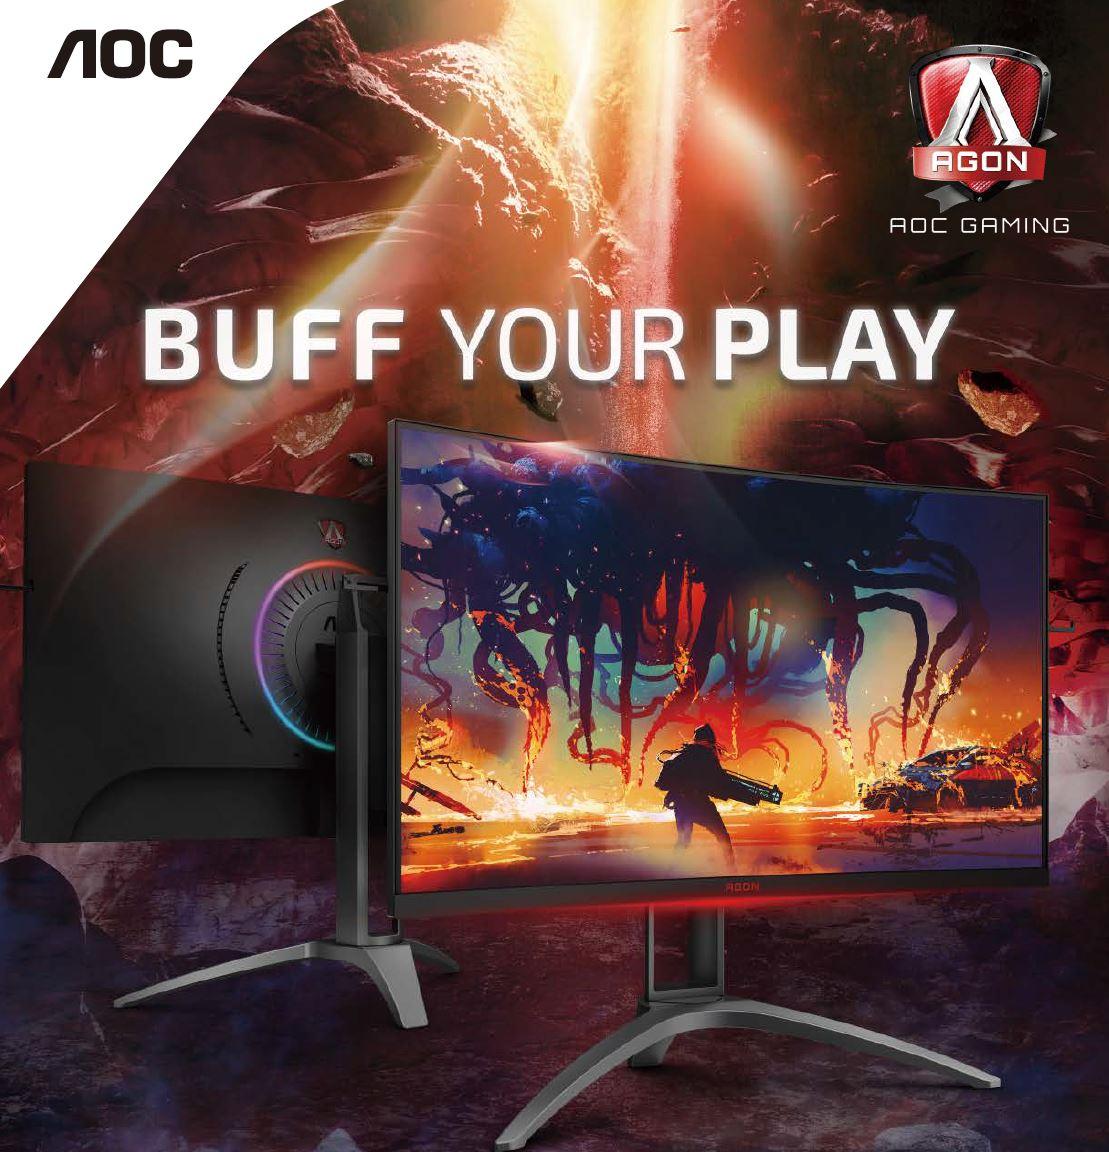 AOC 31.5' AGON 2560x1440 QHD VA 1ms,144Hz 550nits Curved 1500R, Free-Sync 2, HDR 400, USB 3.2 Gen1× 4, Speakers  HAS